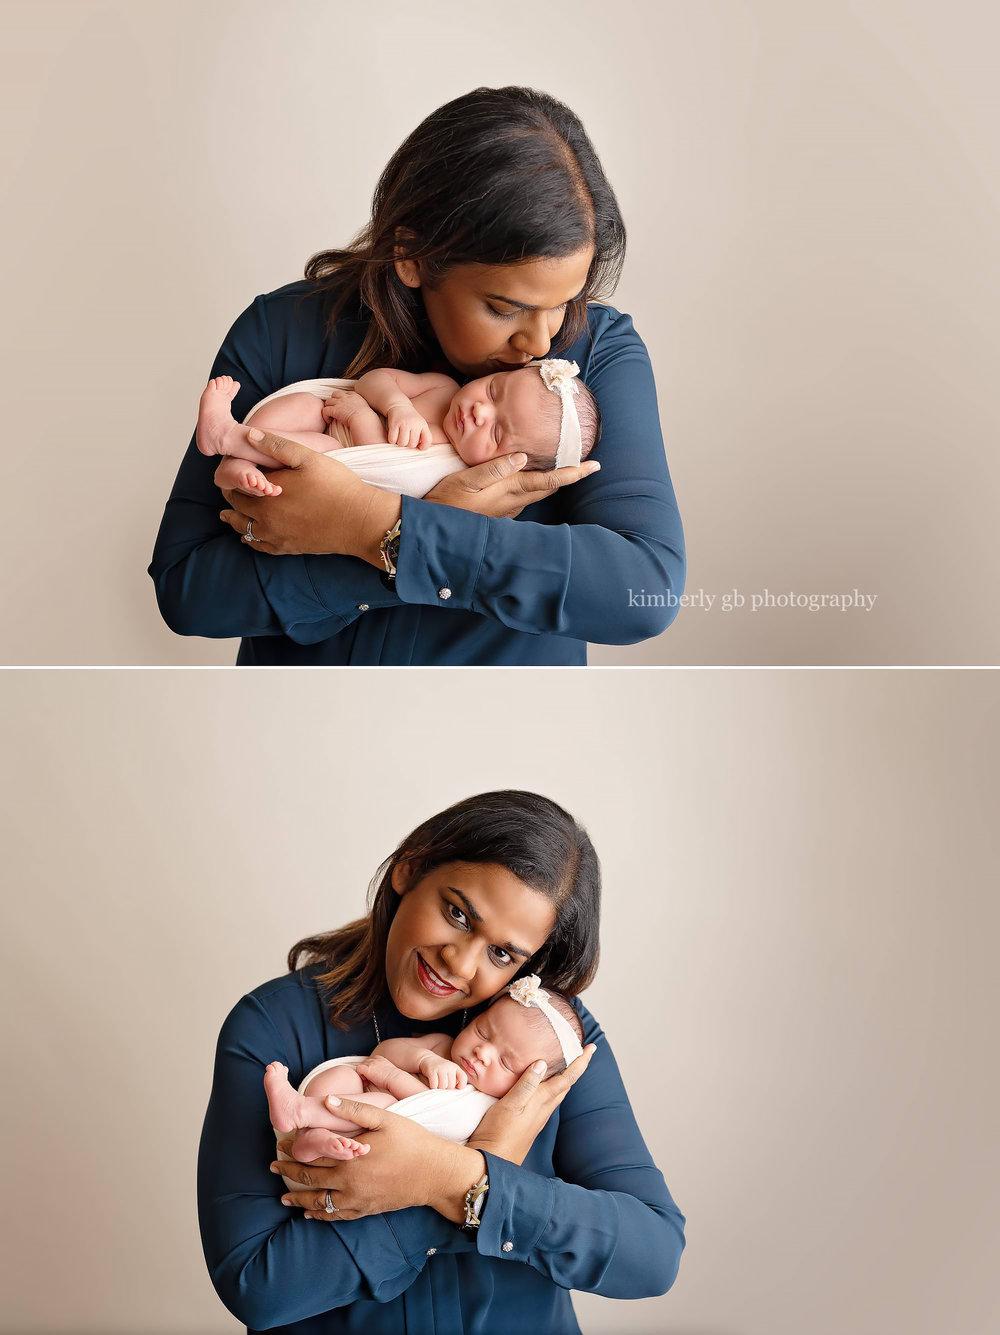 fotografia-de-recien-nacidos-bebes-newborn-en-puerto-rico-kimberly-gb-photography-fotografa-2.jpg